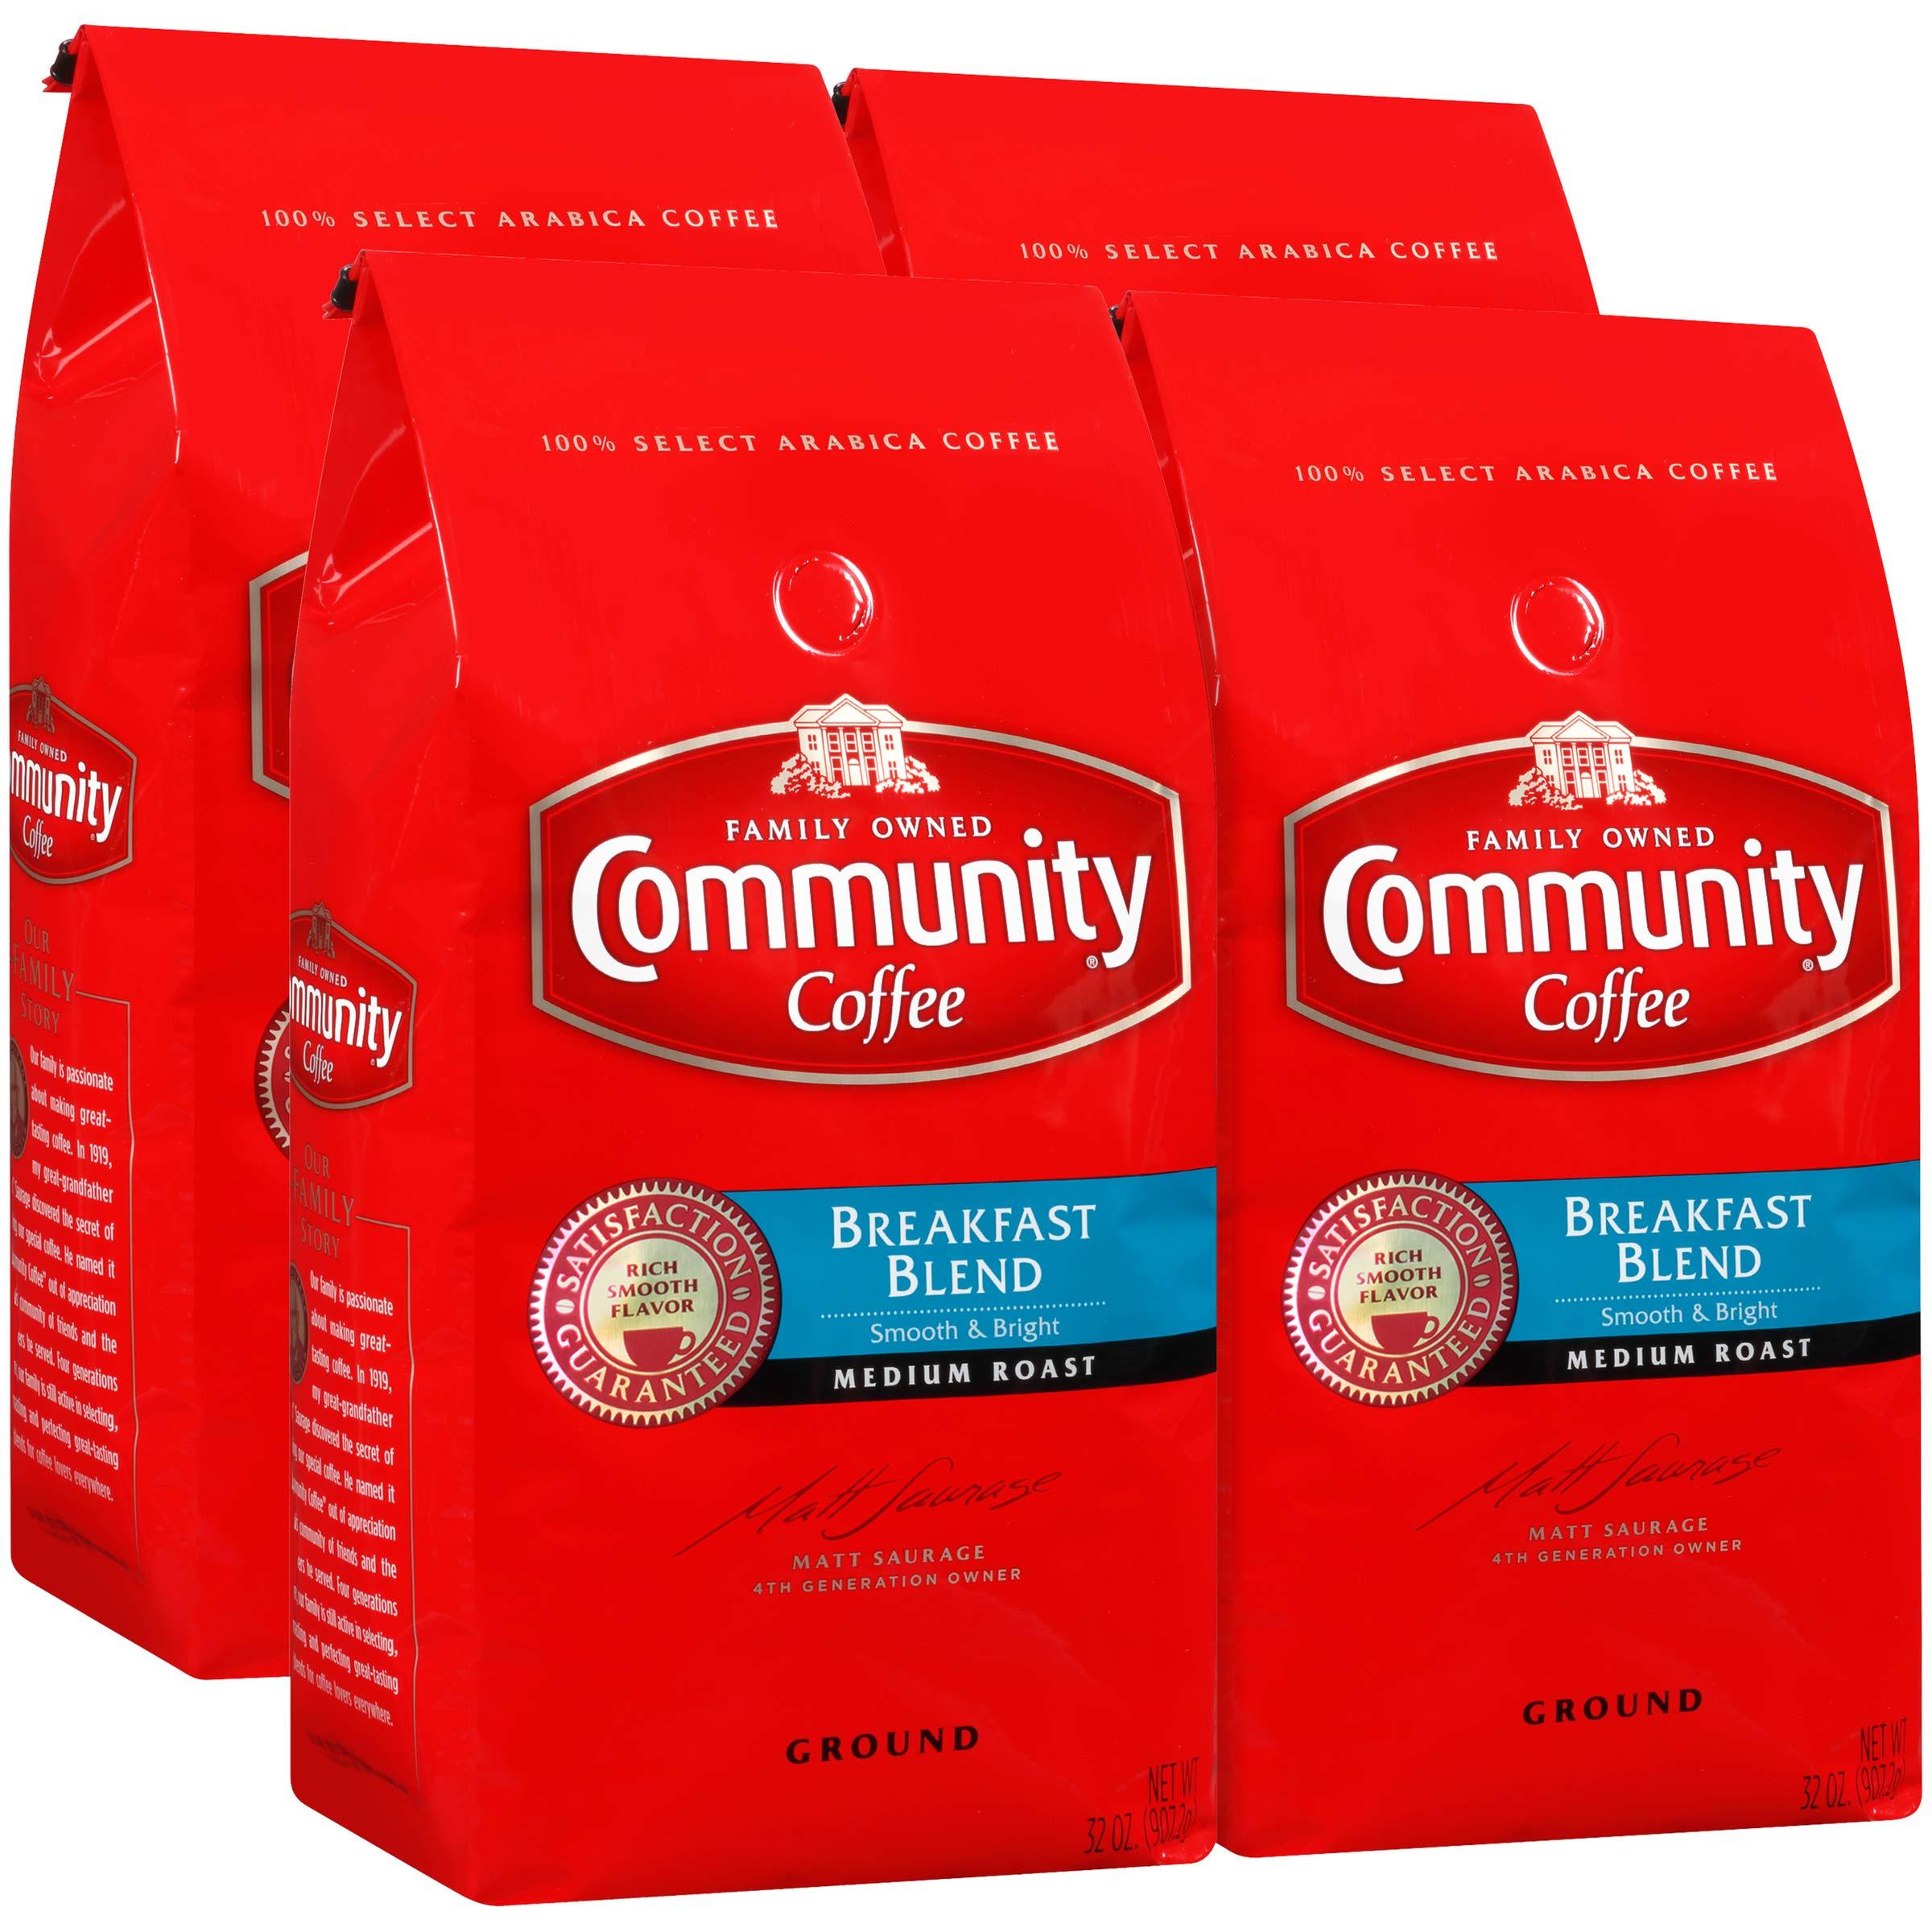 Community Coffee Breakfast Blend Medium Roast Premium Ground 32 Oz Bag (4 Pack), Medium Full Body Smooth Bright Taste, 100% Select Arabica Coffee Beans